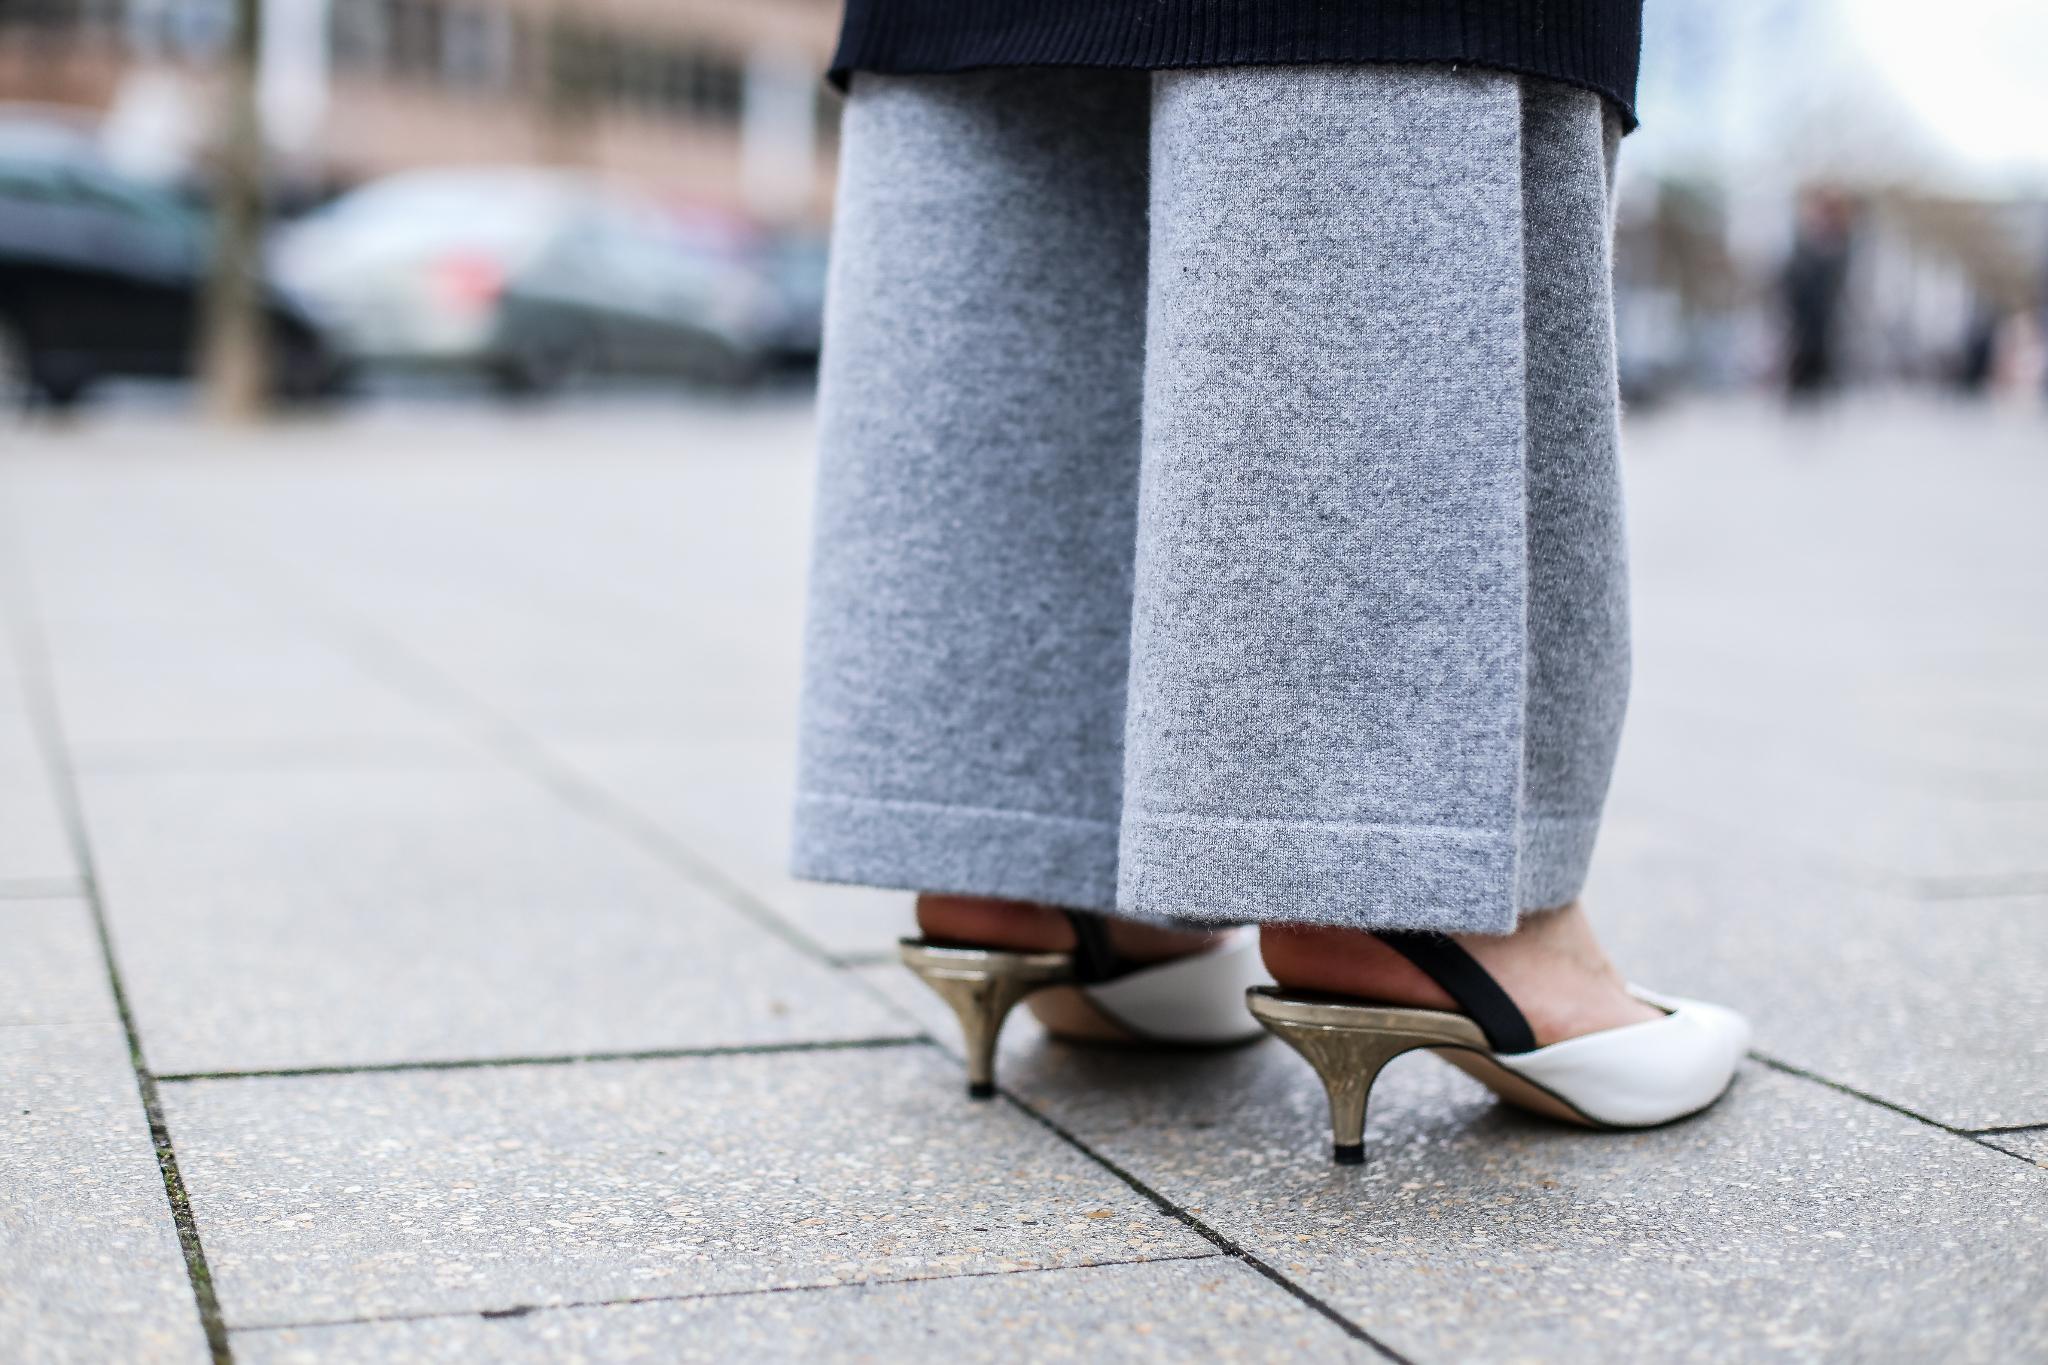 MOD-by-Monique-Fashion-Looks-Neutral-Layers-33